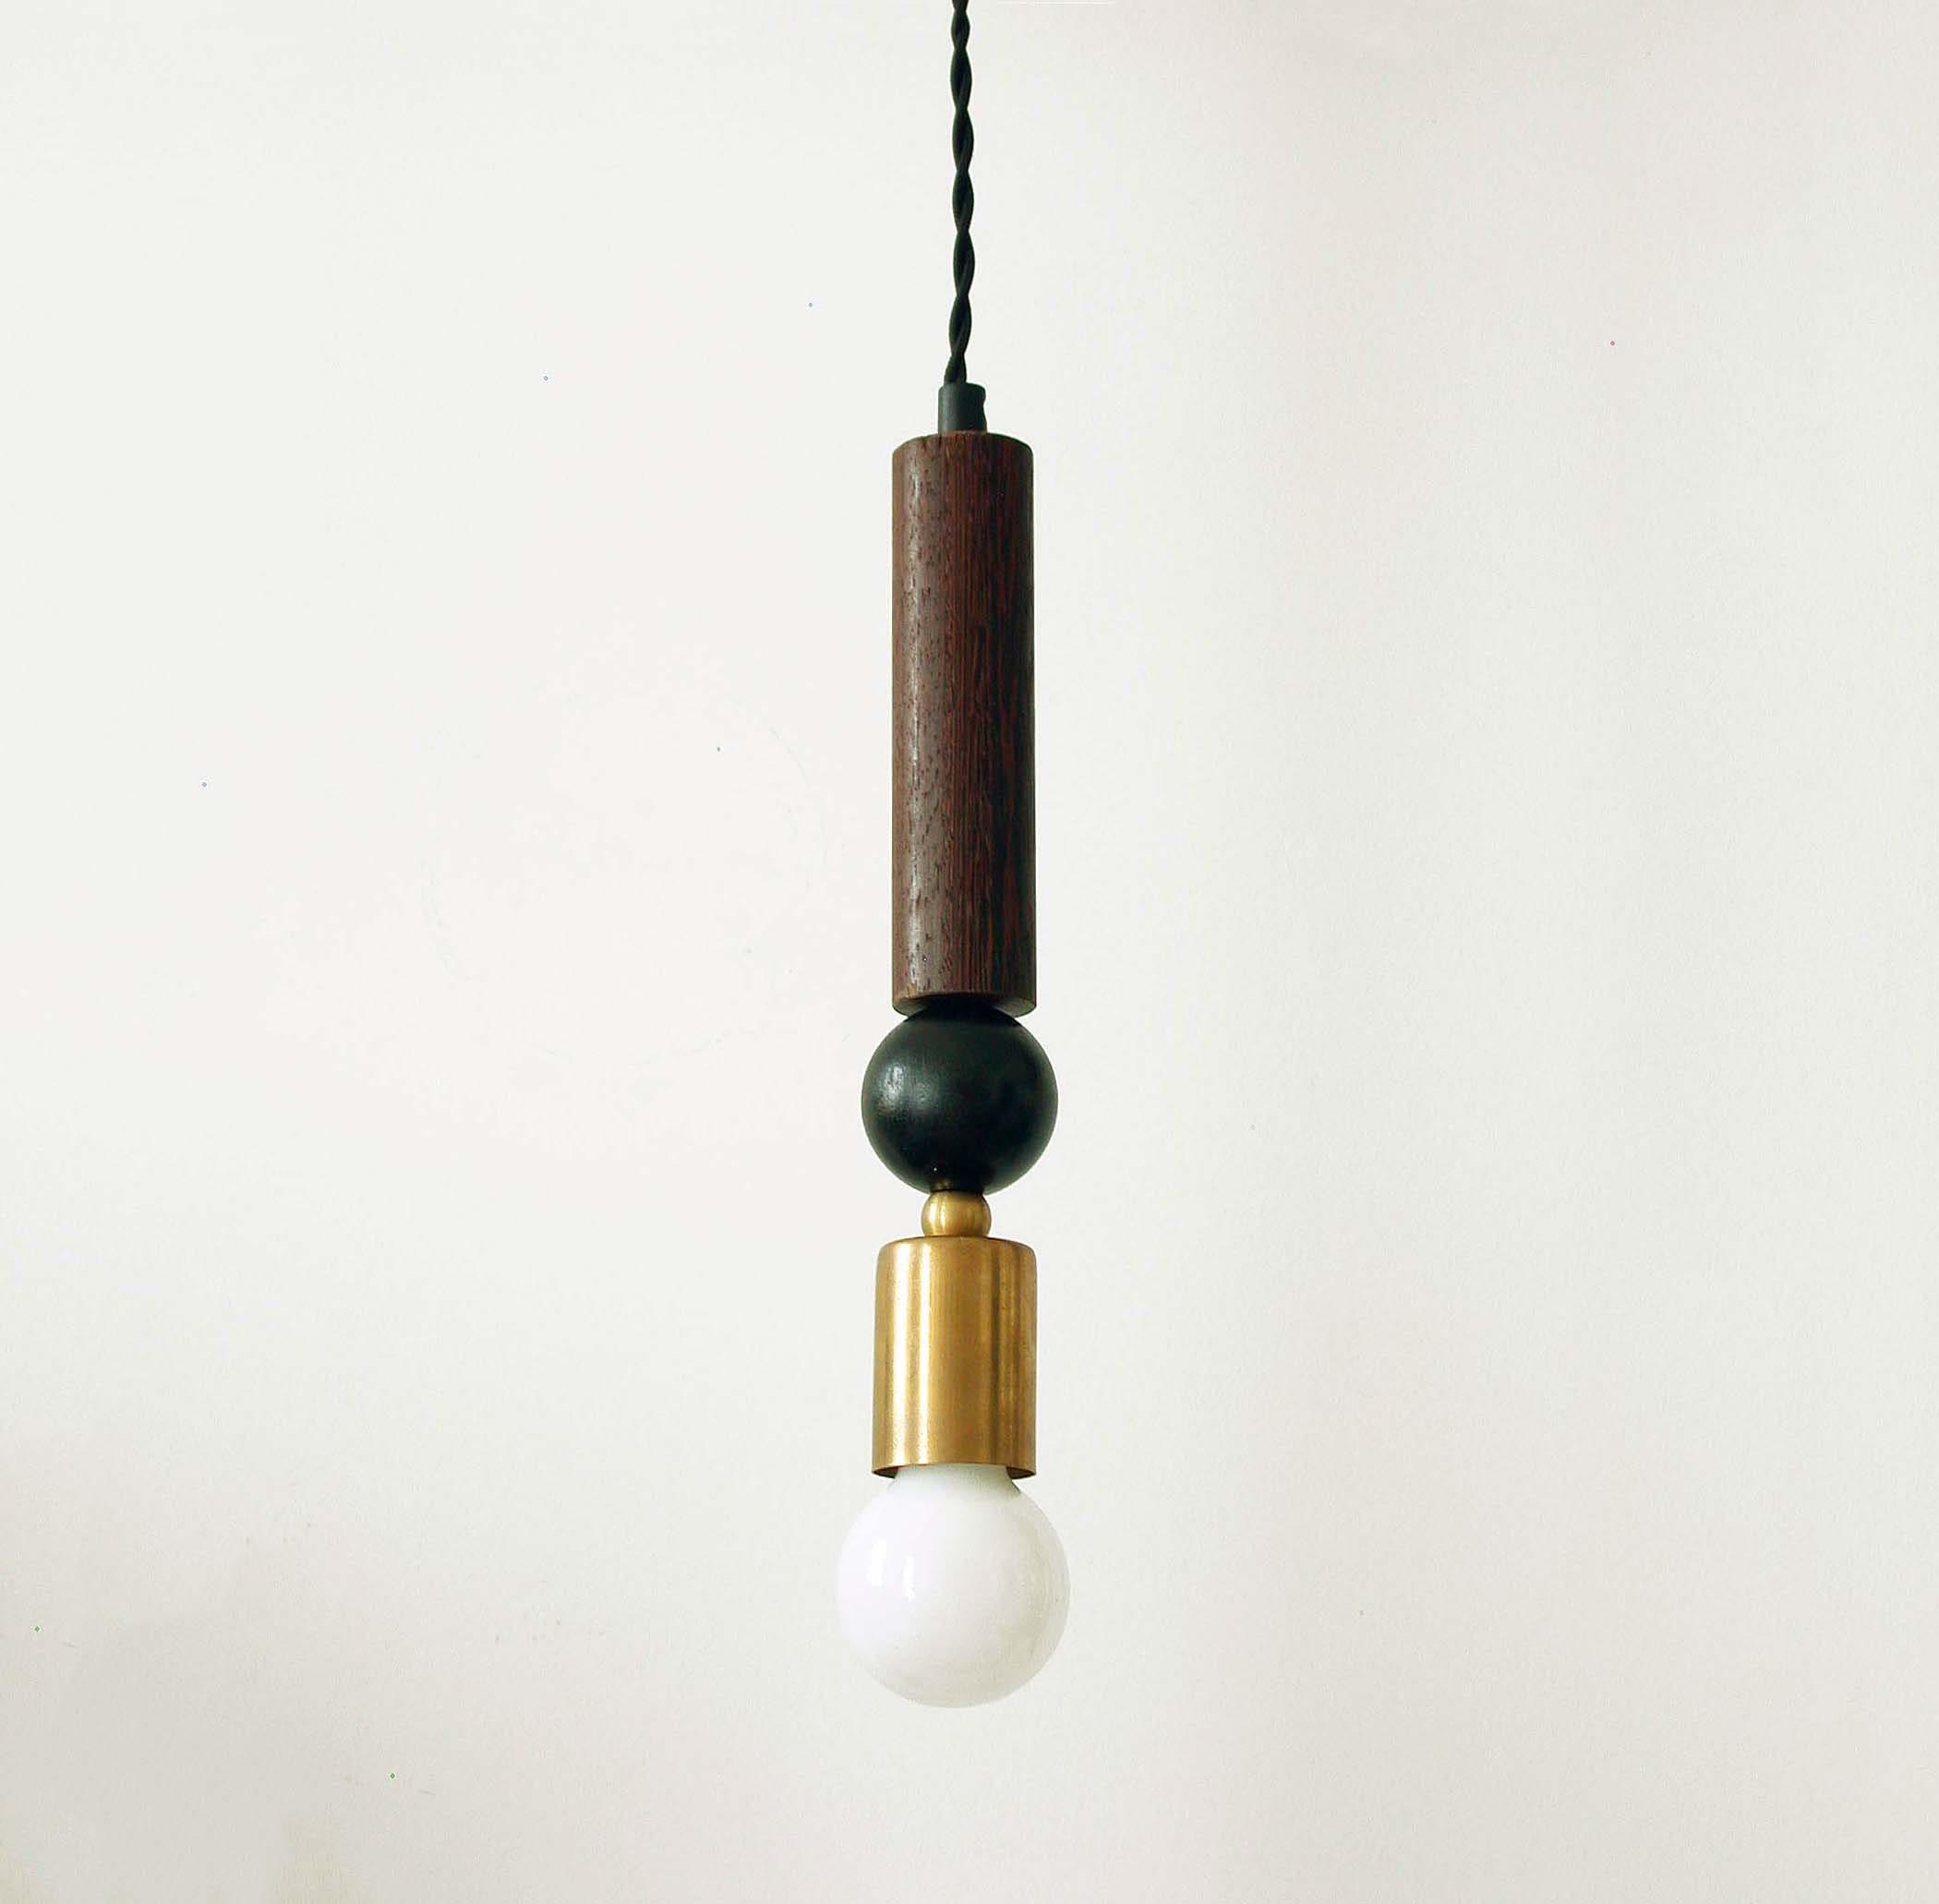 Black gold pendant light modern wood brass pendant kitchen island lighting boho lights modern pendant modern ceiling light designer lighting